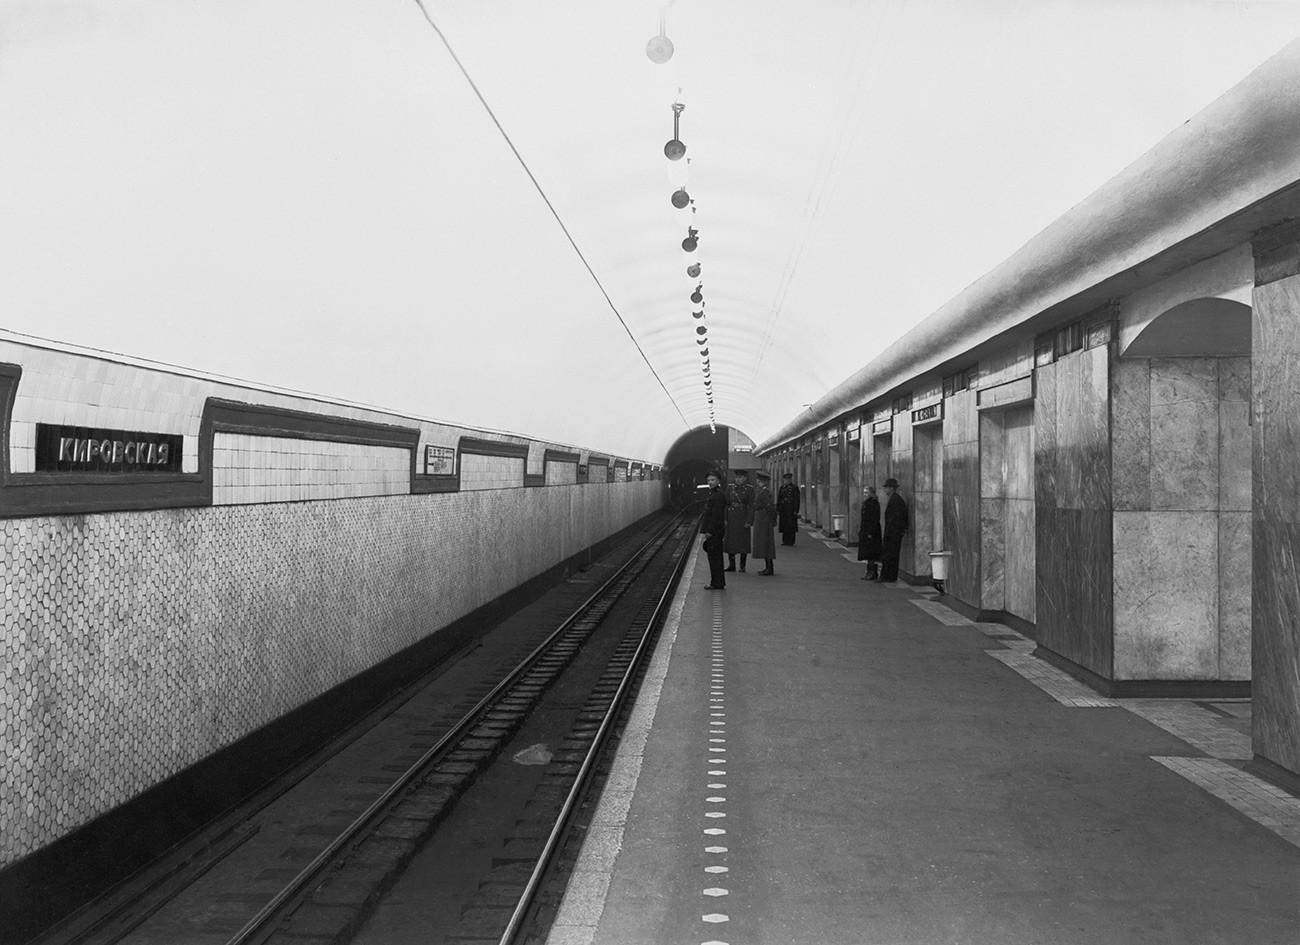 Stasiun Kirovskaya (Chistye Prudy).